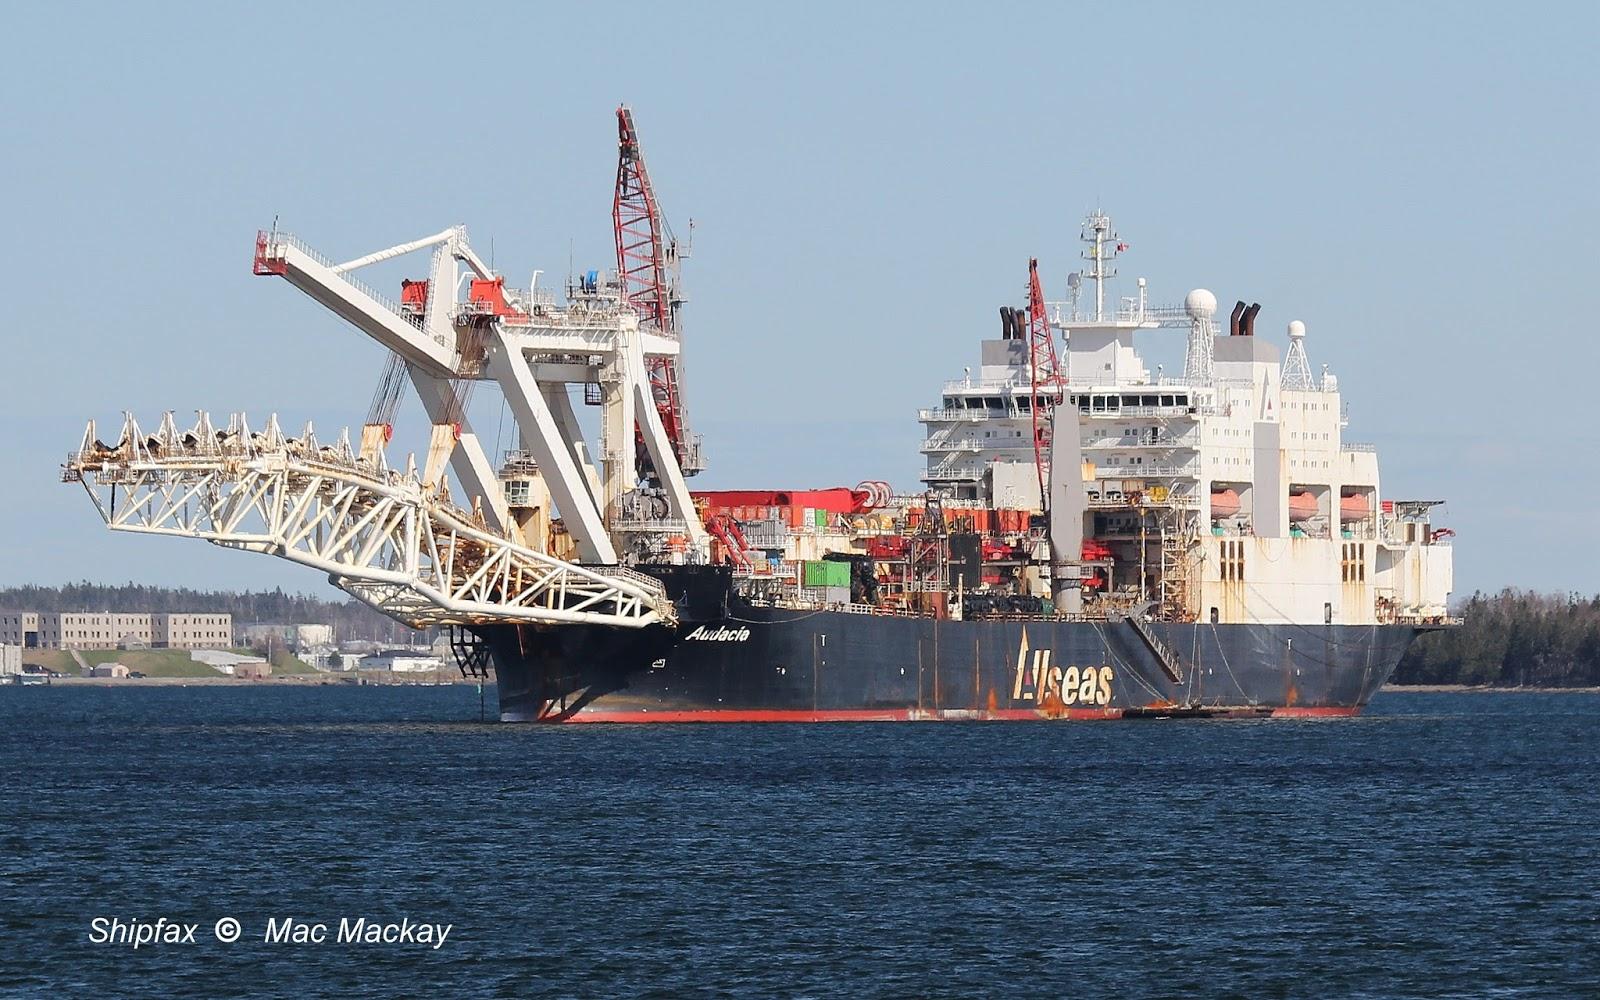 Shipfax: Audacia - unique ship